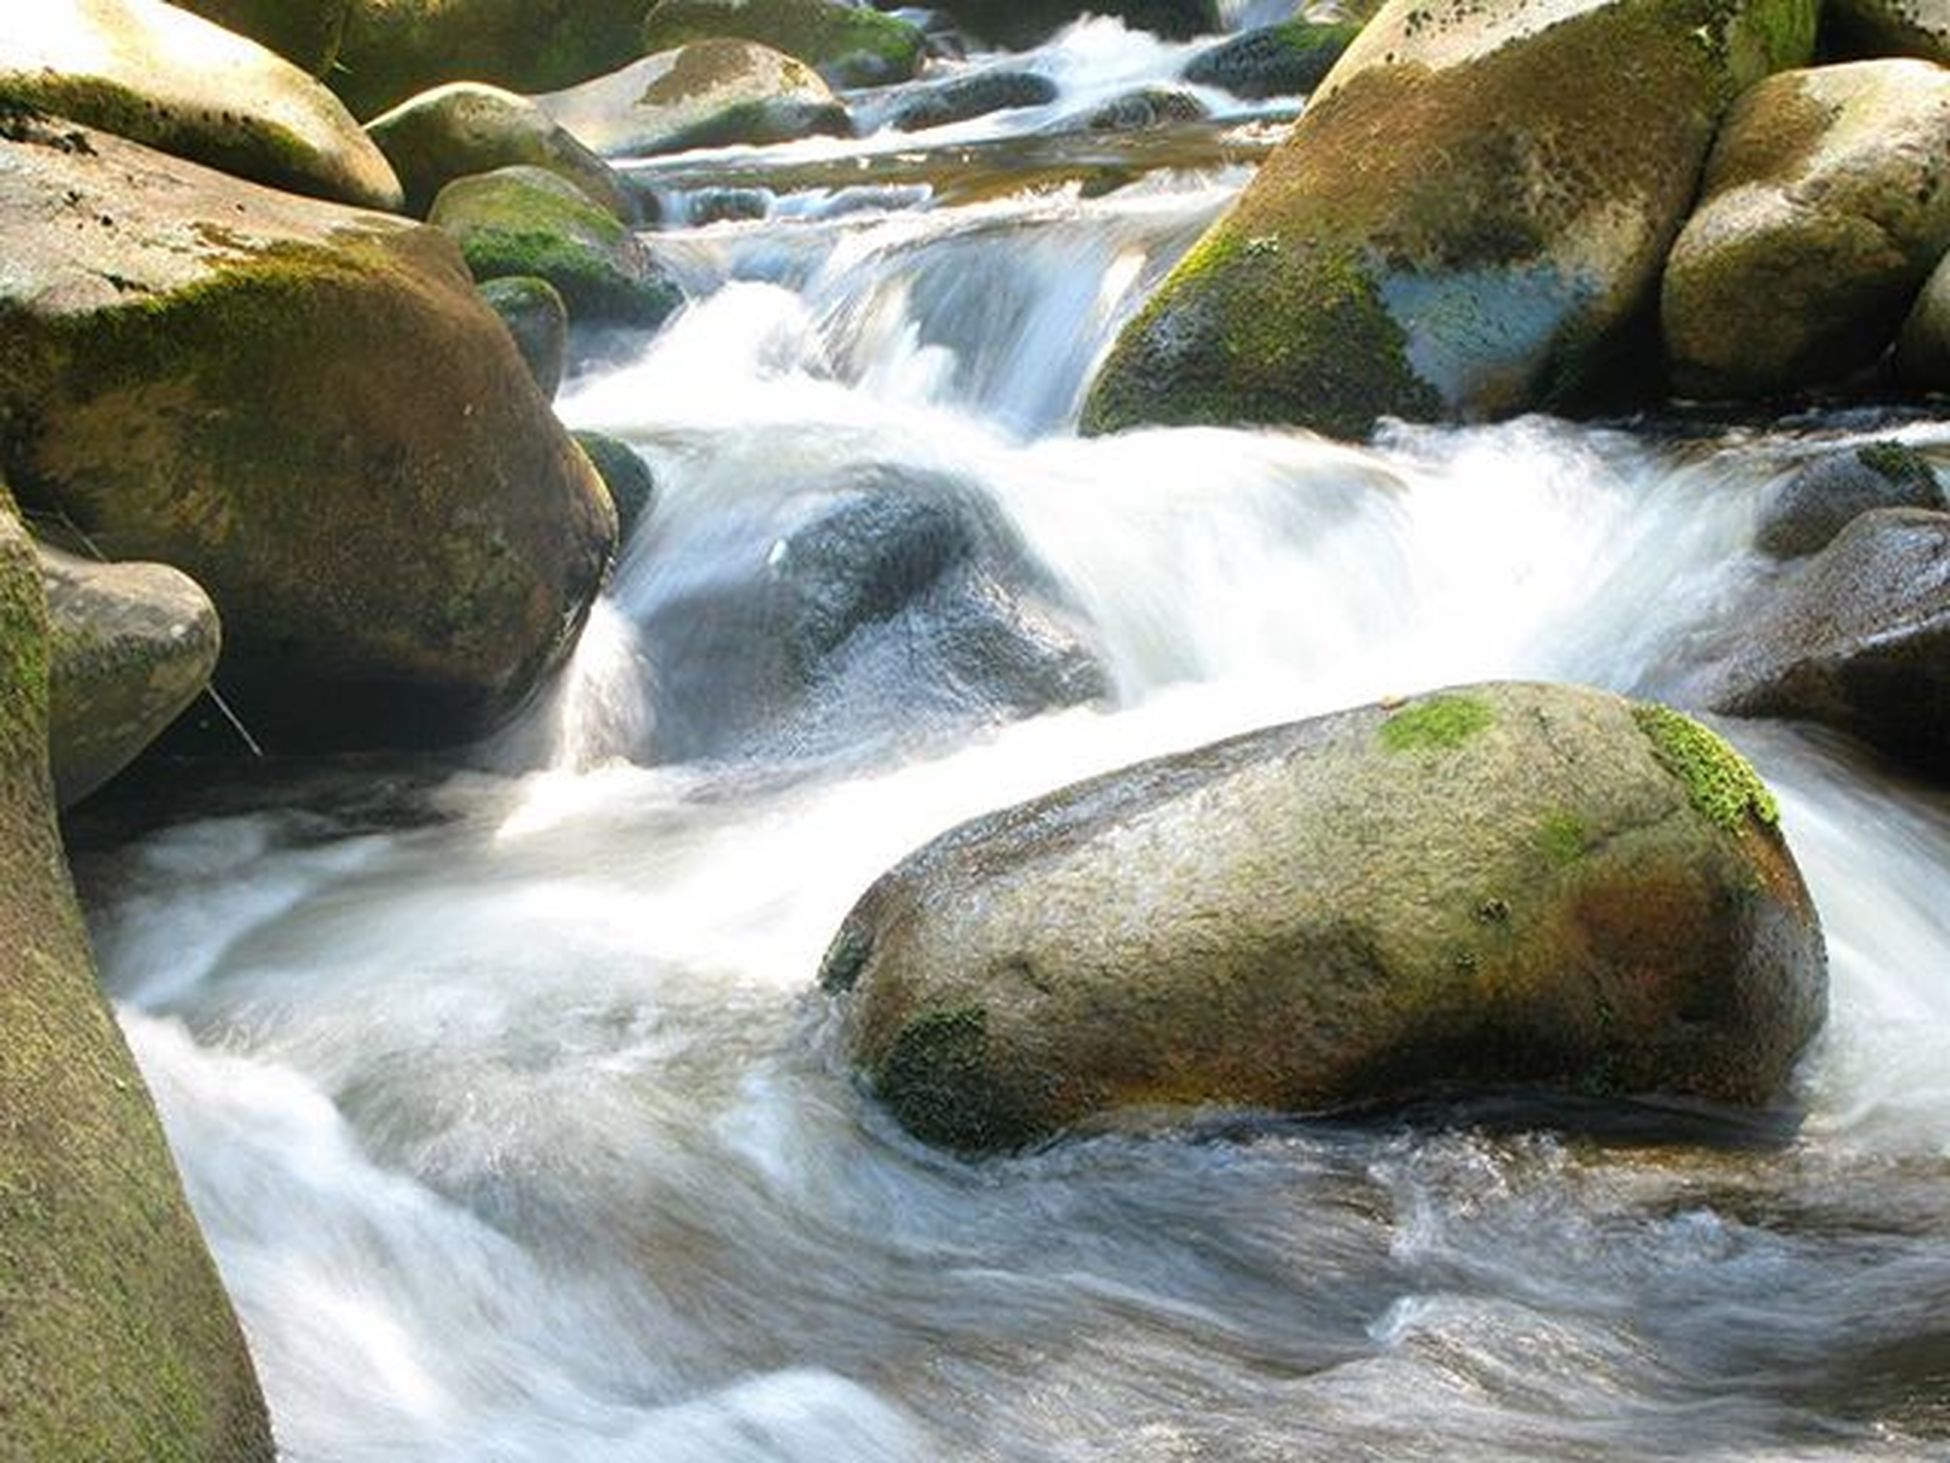 The river Vydra 🐟 River Czechrepublic Czech Šumava Kasperky Kasperskehory Vydra Stones Water Wild Nature Wildlife Wildlifephotography Forest Photooftheday Marvelshots Photo